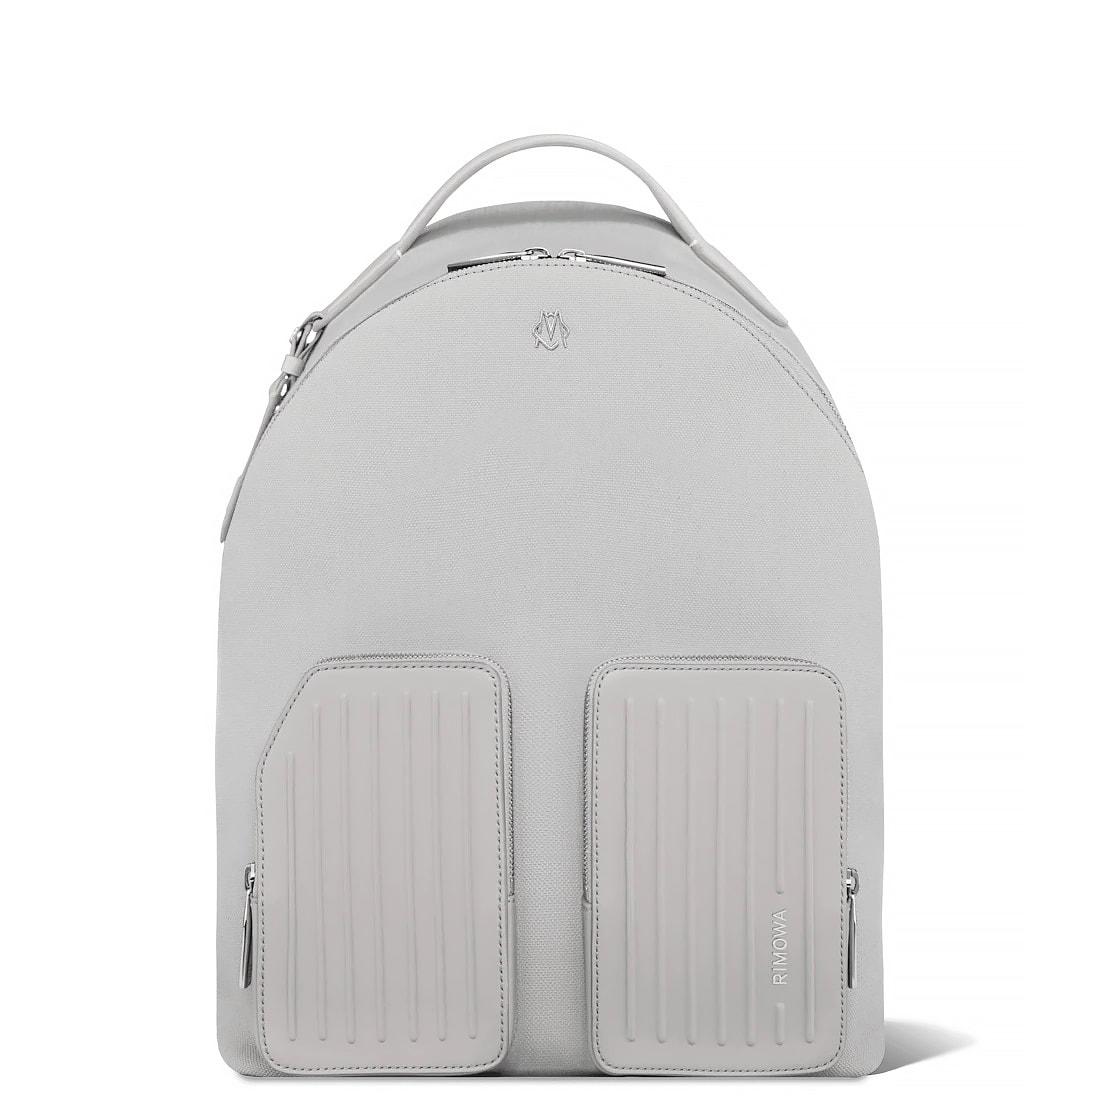 Luxury backpack for women